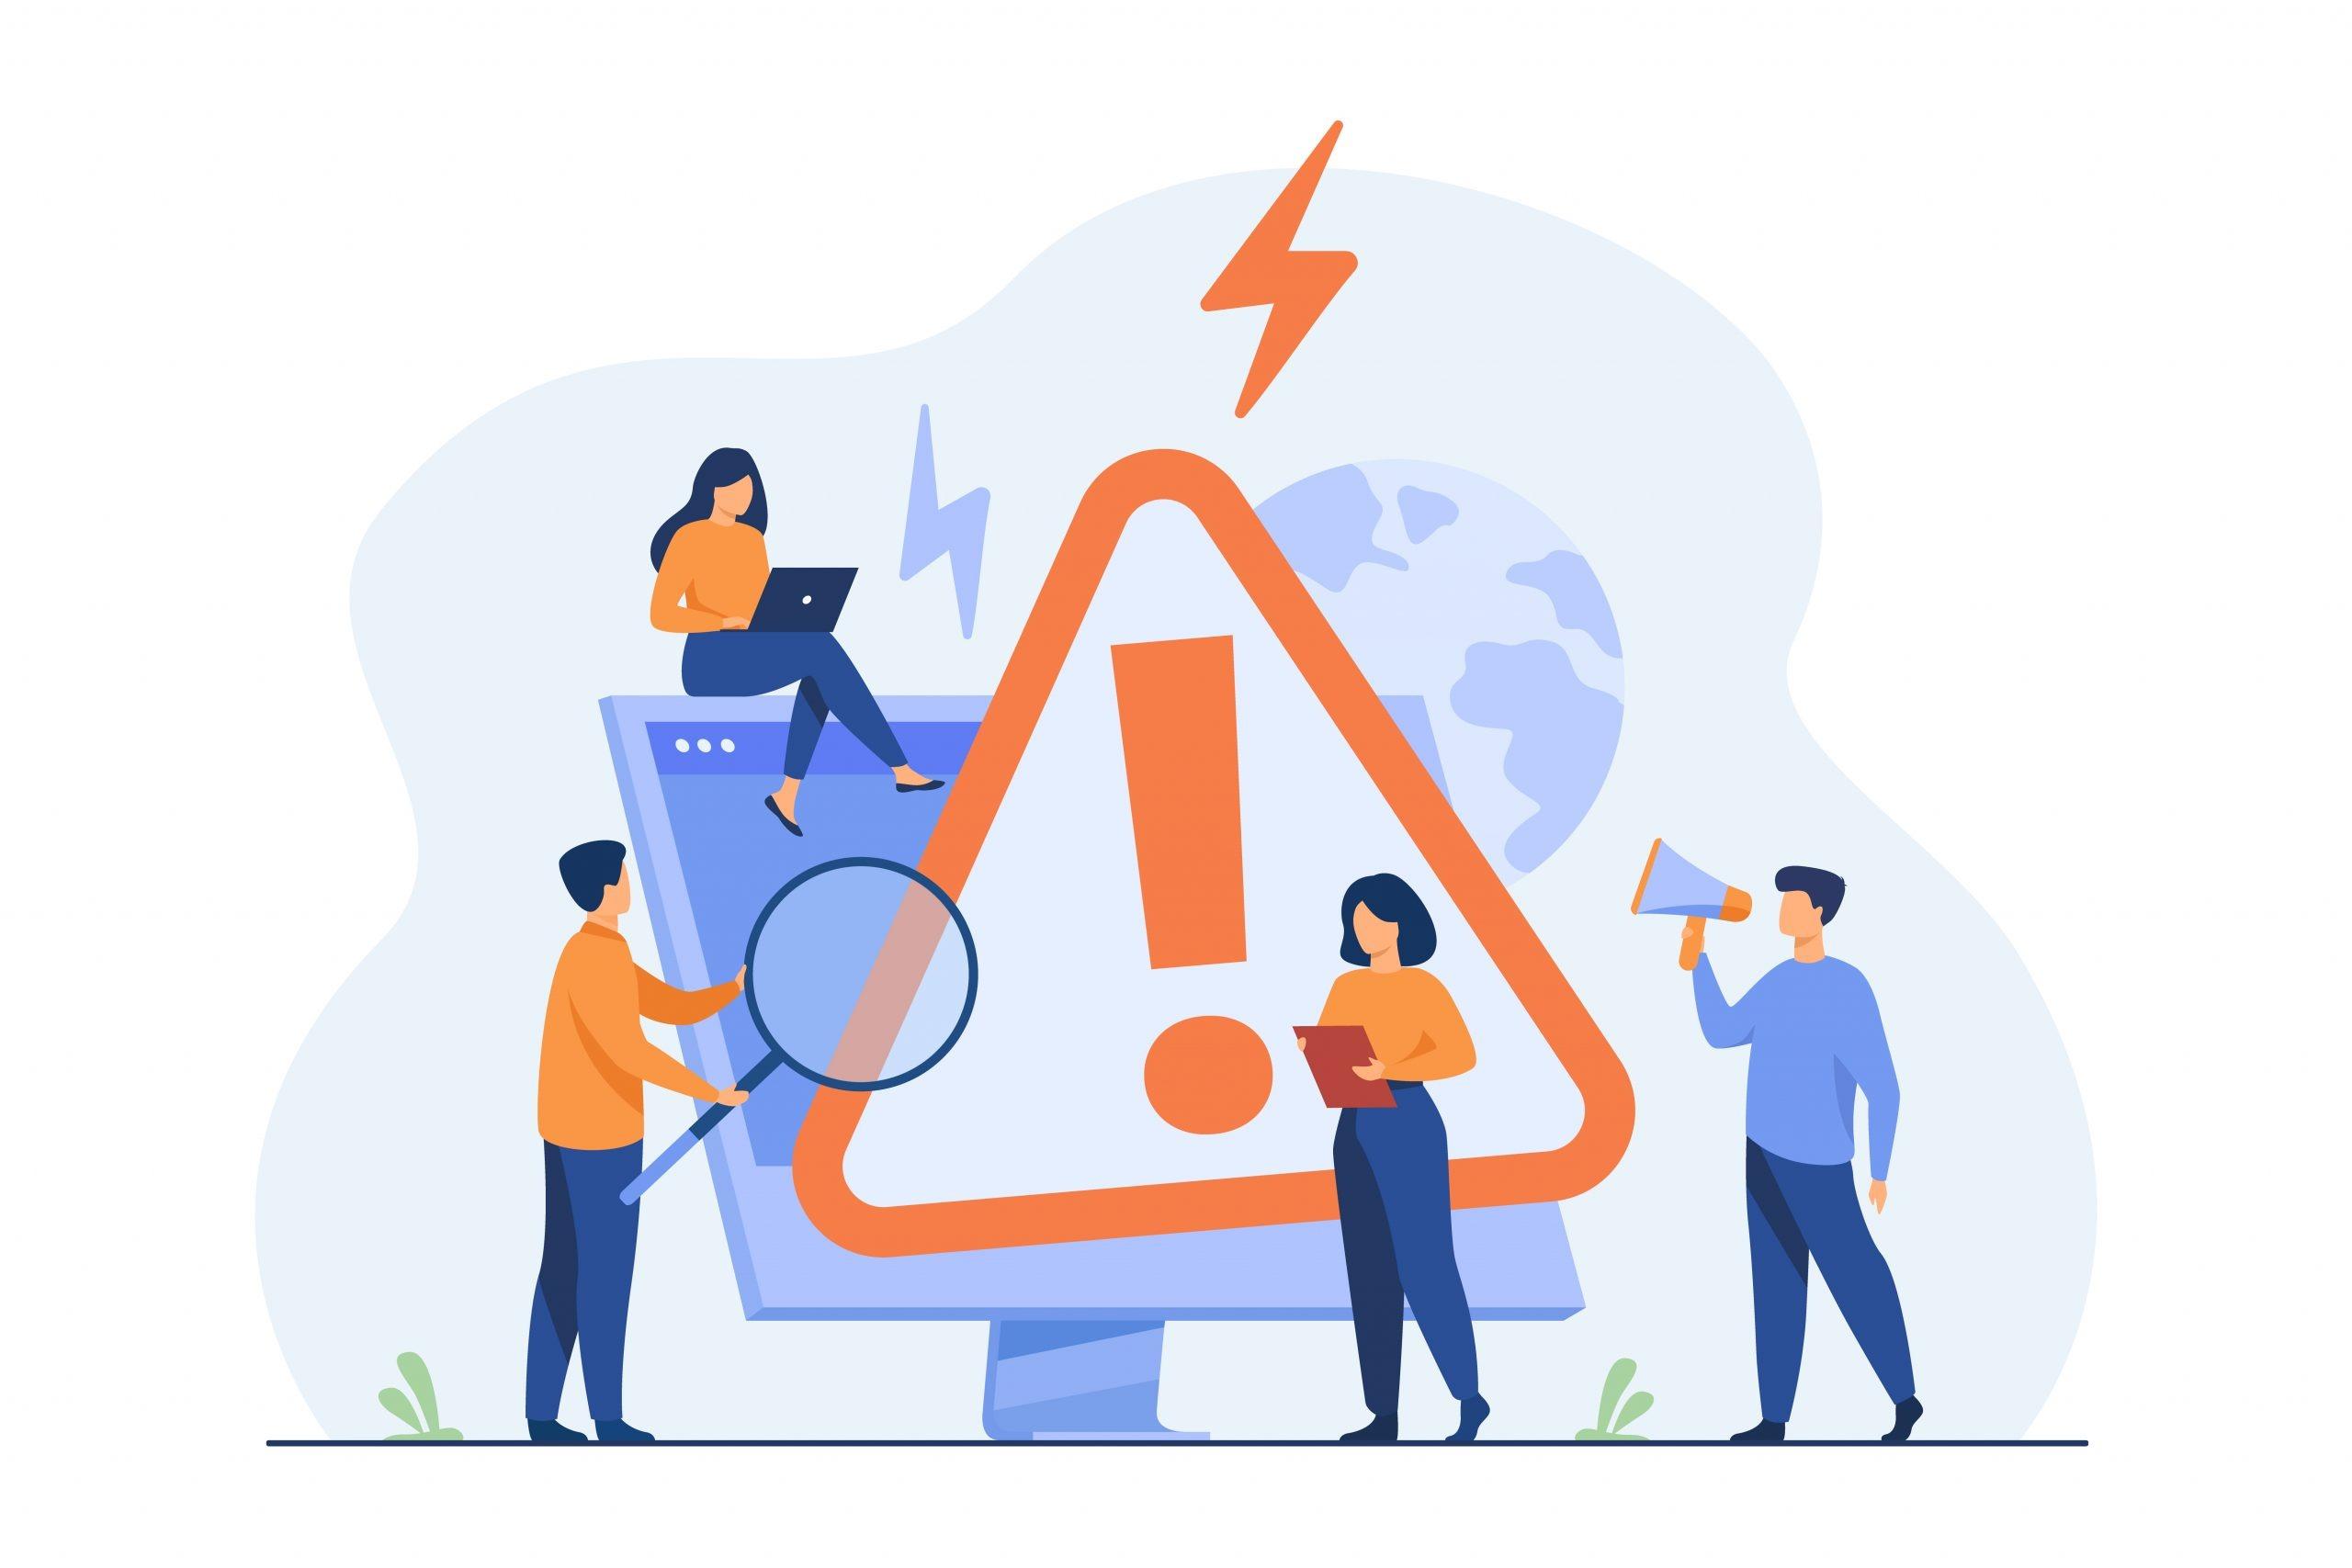 Web development agency mistakes